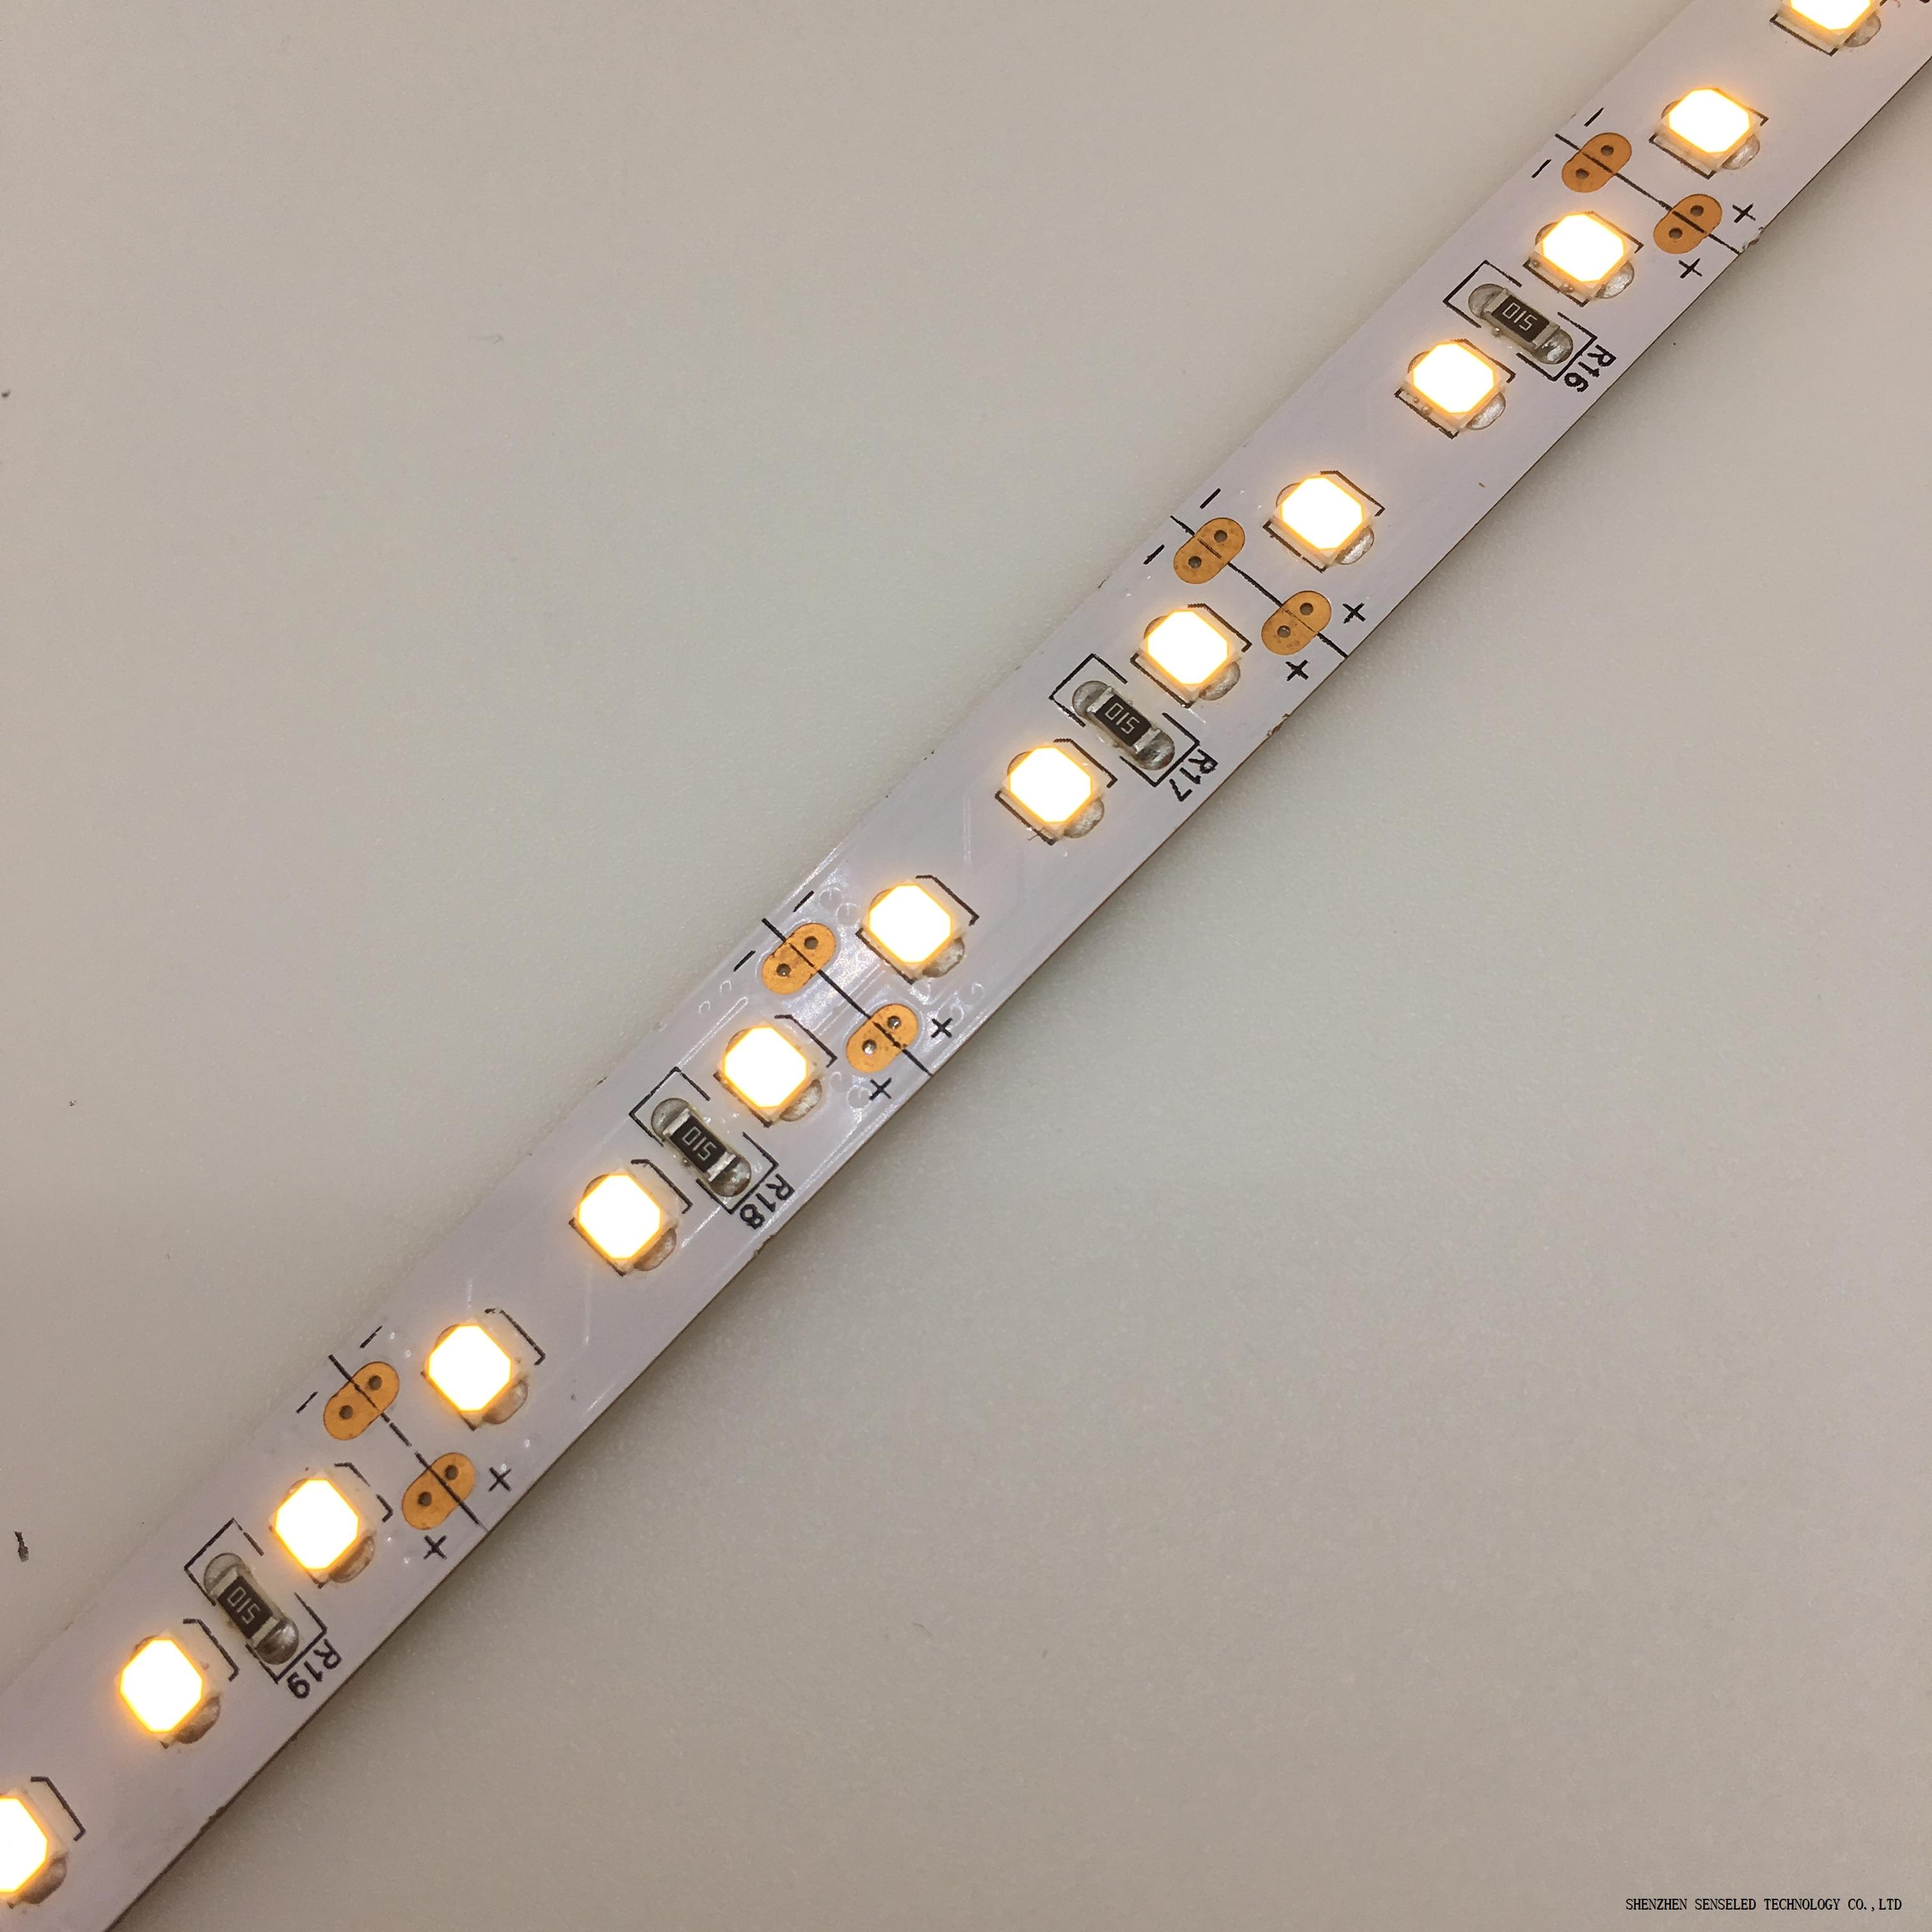 UL Listed 2835-12v-12030K 80RA IP20 Led strip light with 5 warranty